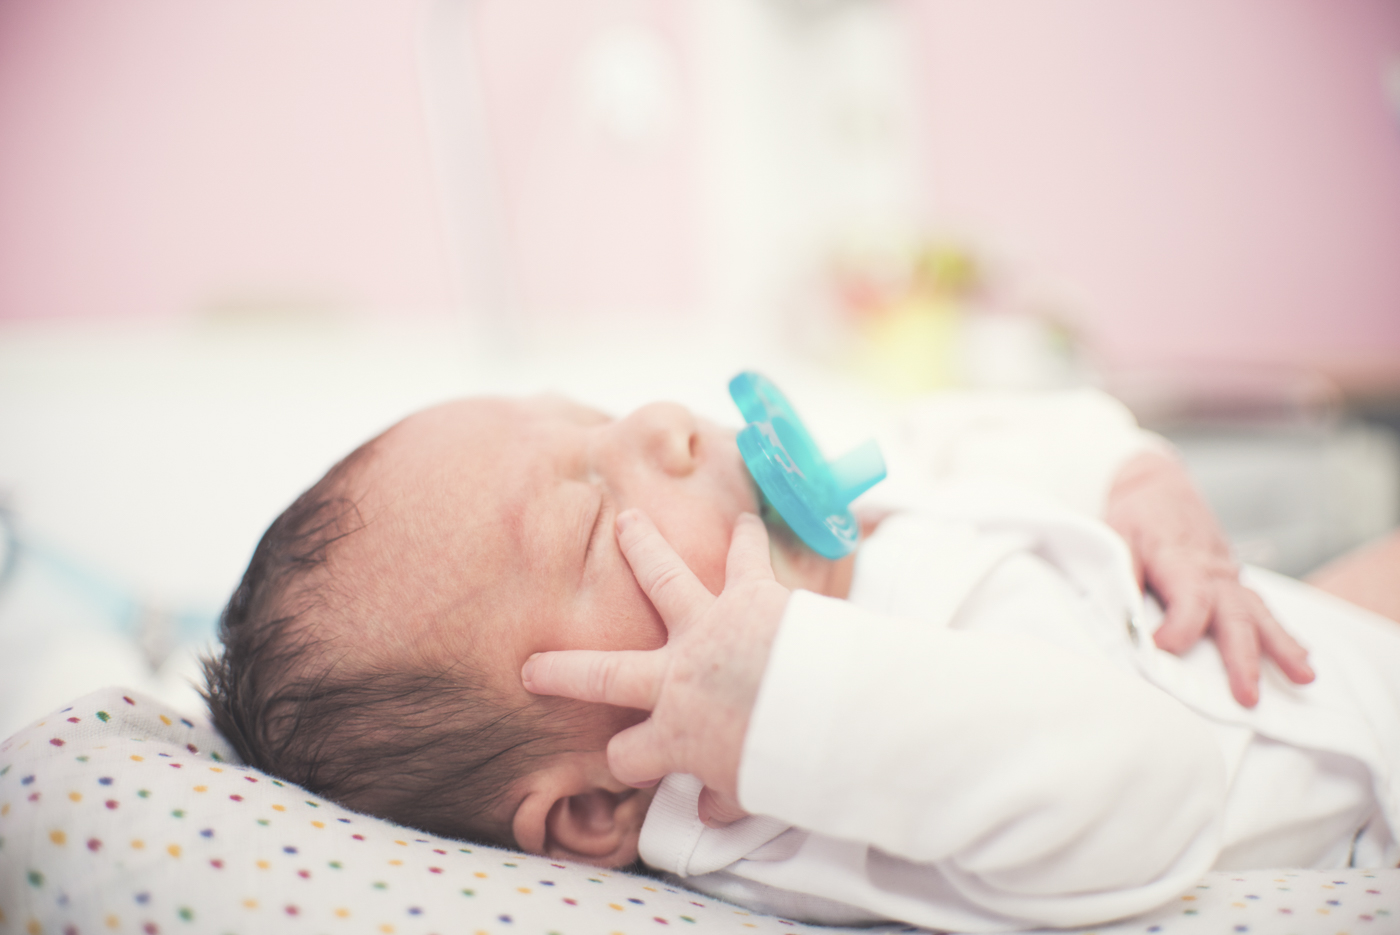 portfolio-fotos-bebes-recien-nacidos-ninos-mia-moments-hospitalbrugman-17.jpg